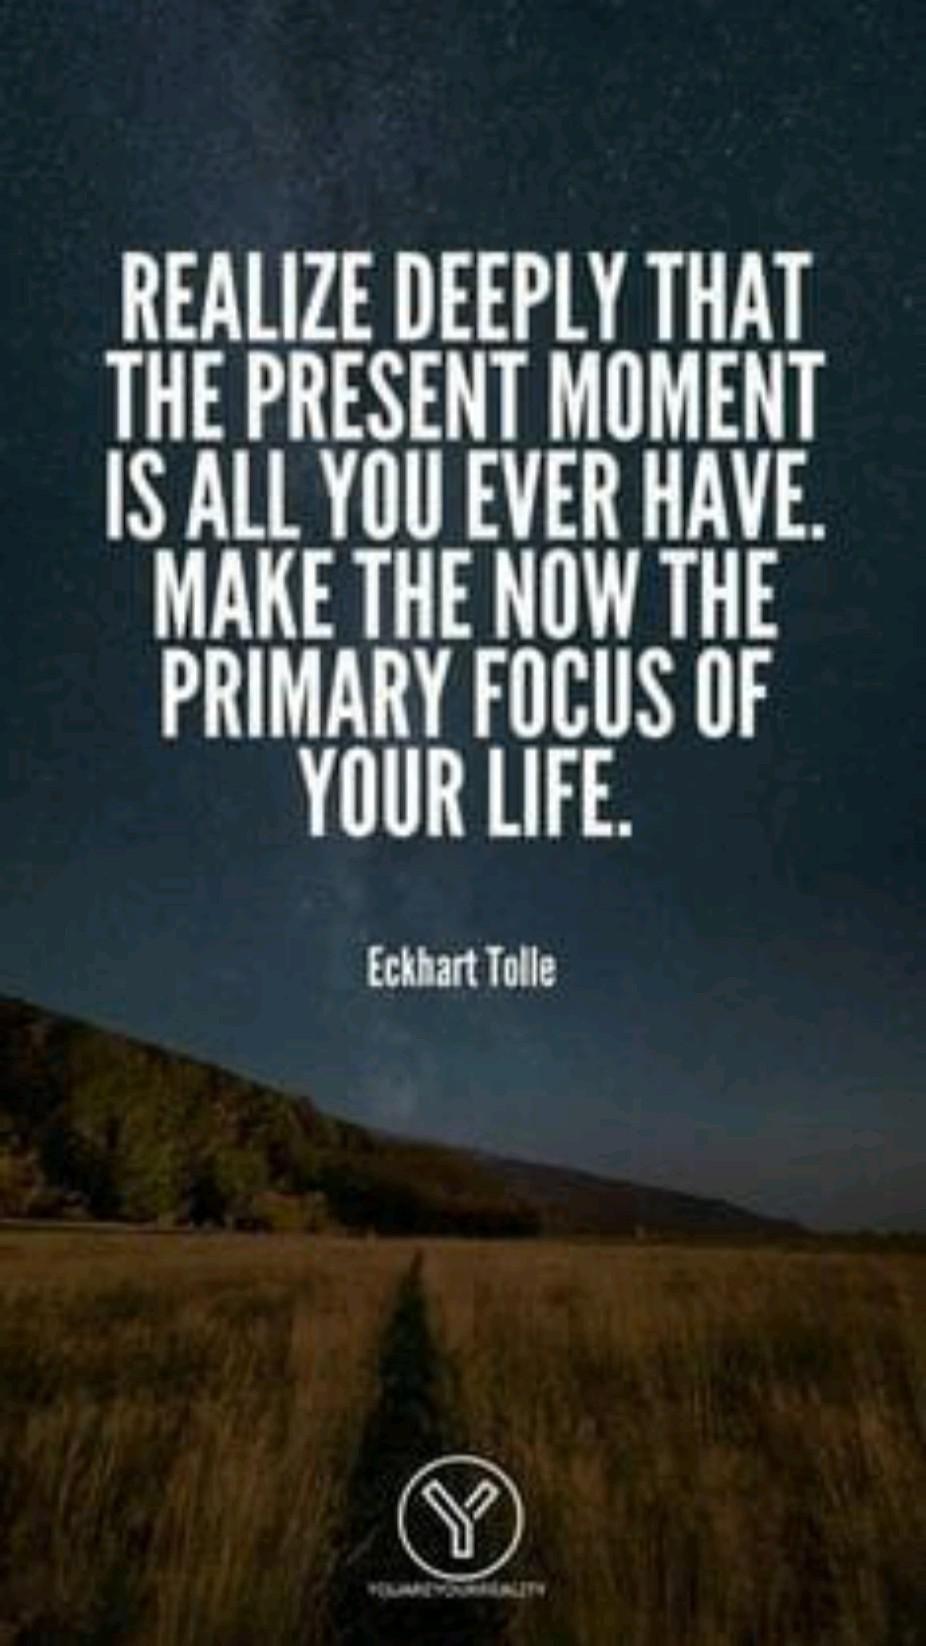 insipirational quotes